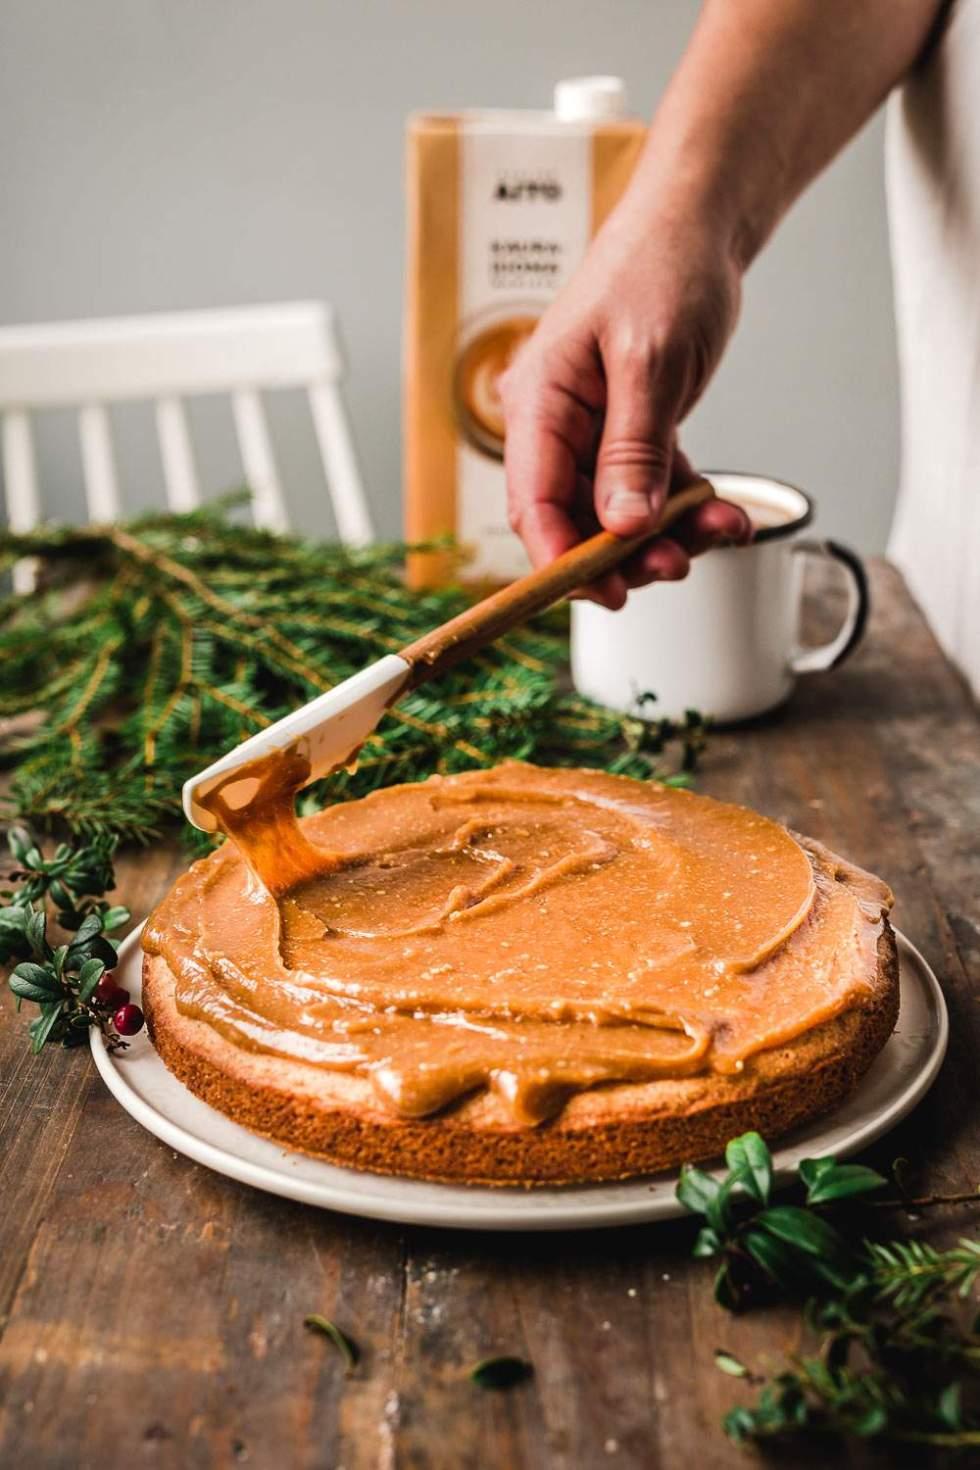 Cardamom cake with caramel frosting (gluten-free, vegan)